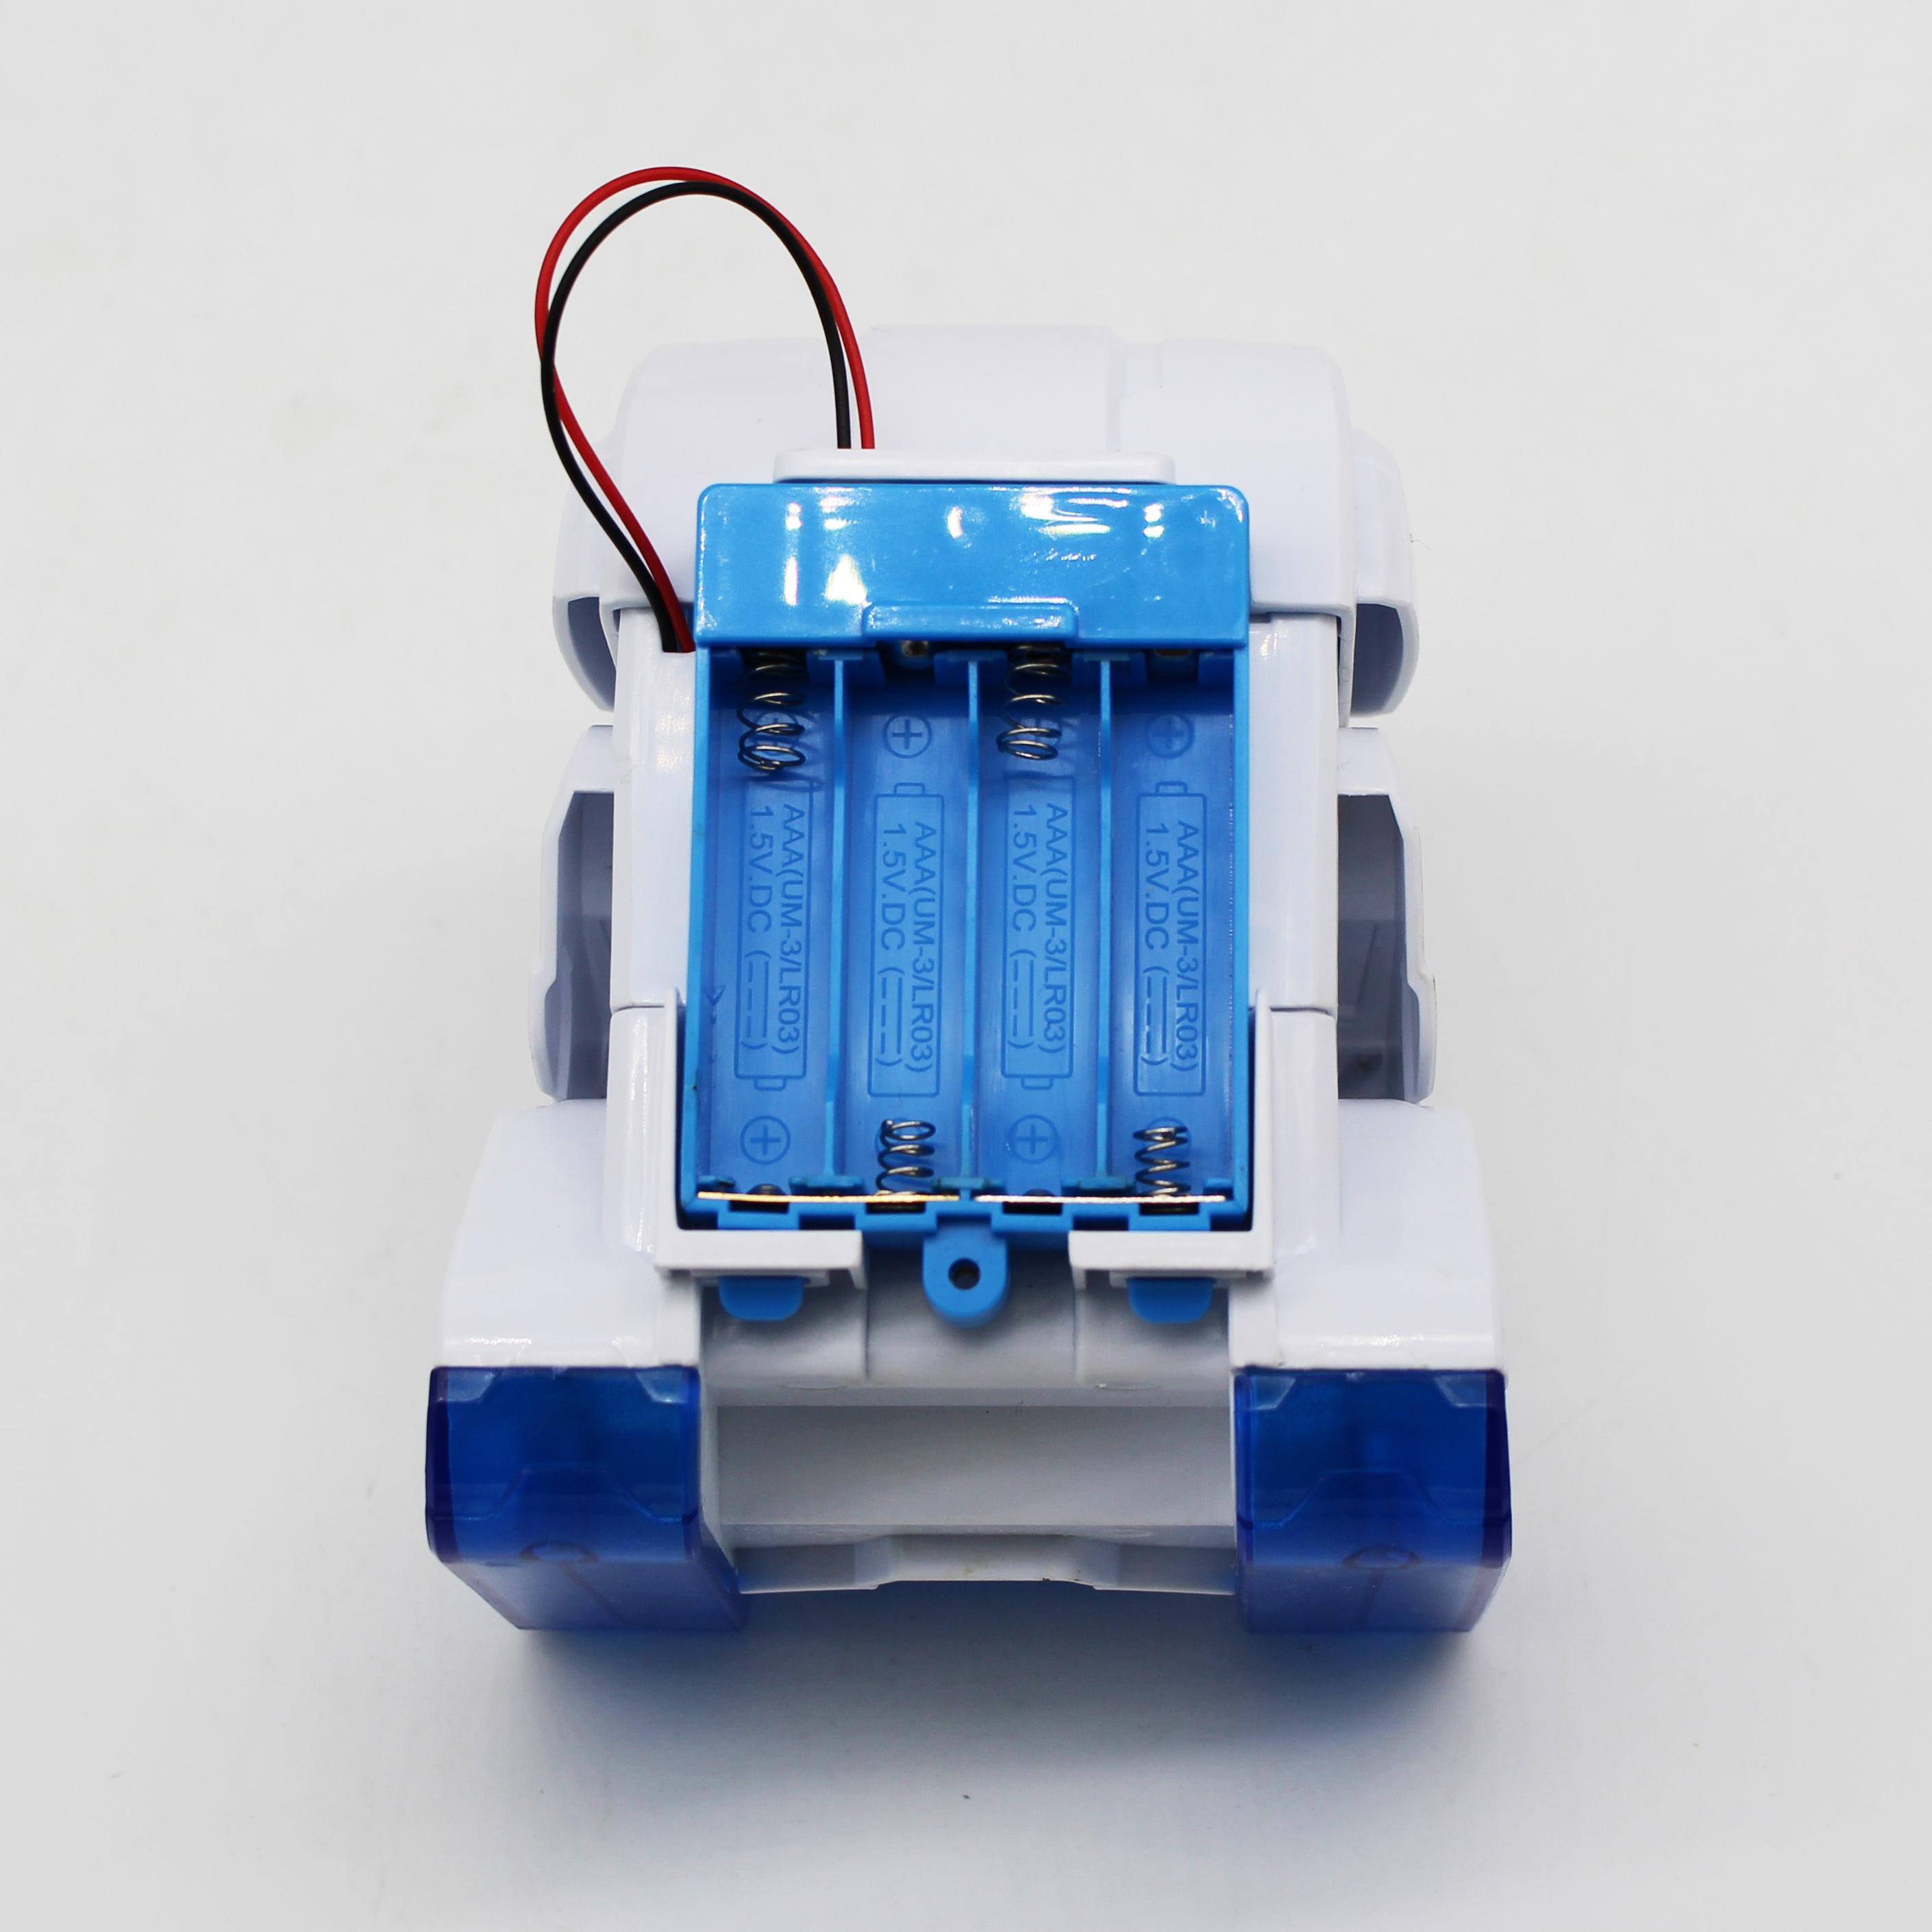 DIY vacuum cleaner robot STEM toys for children-CYHOBBY